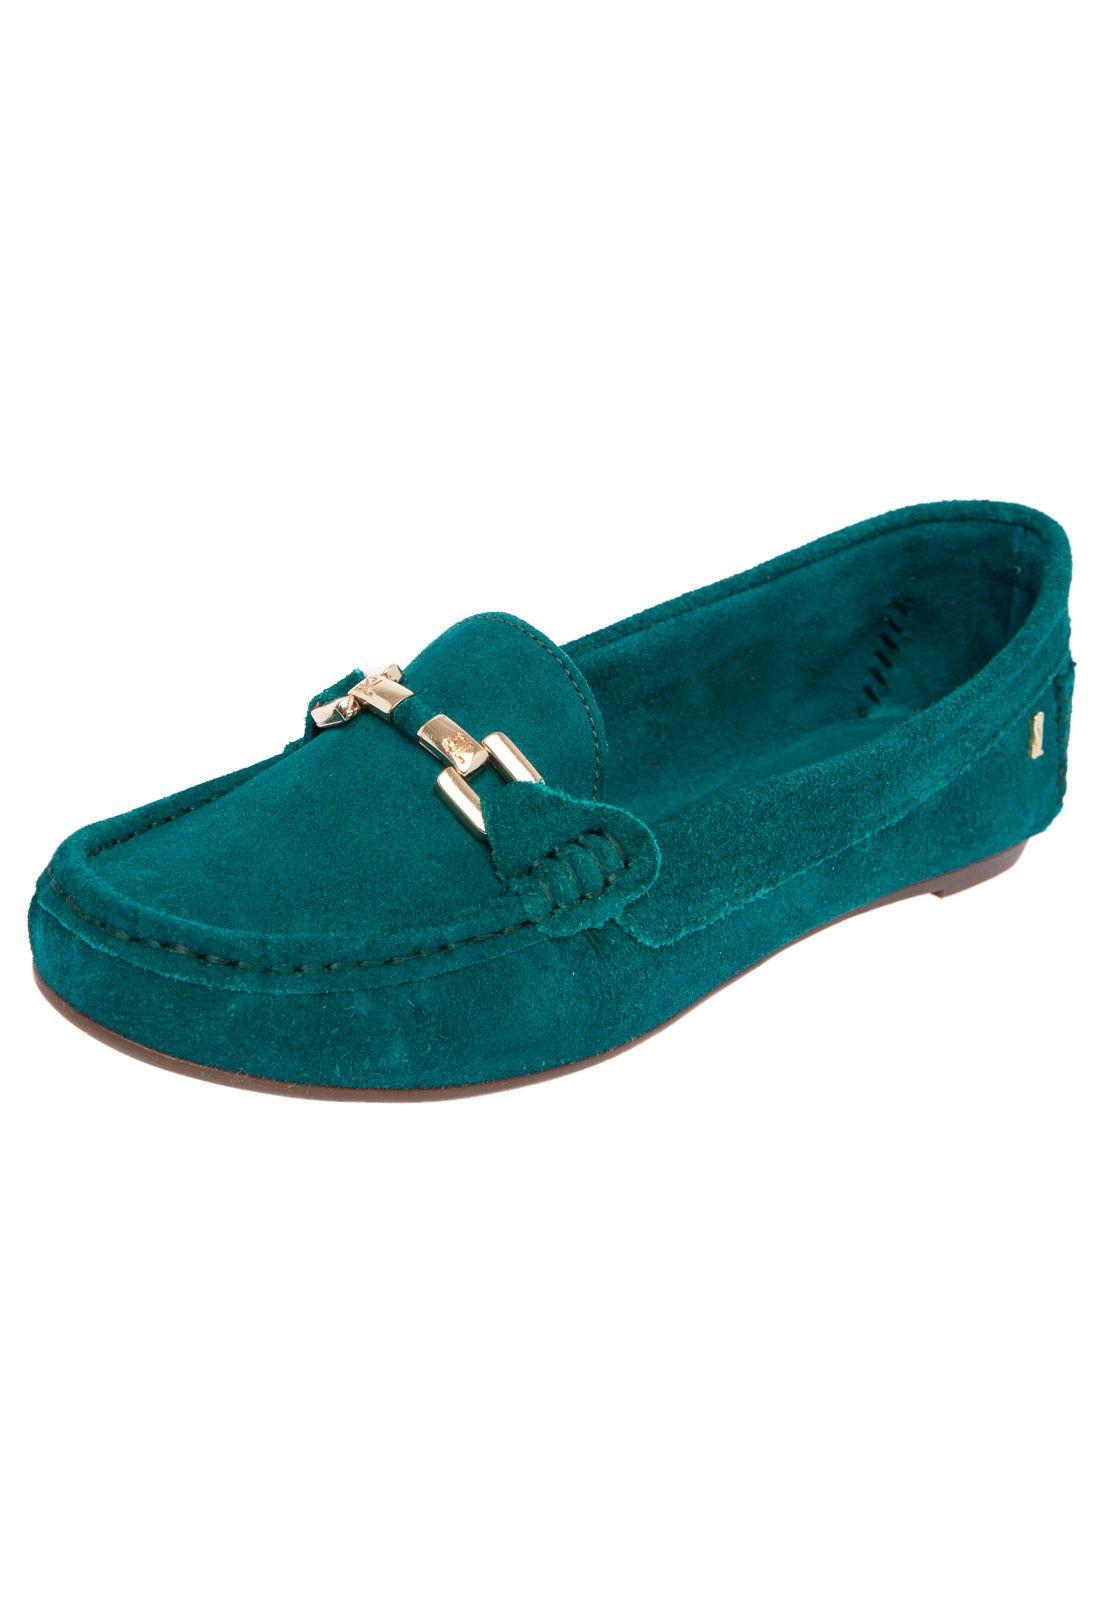 4c672496ead86 Mocassim Santa Lolla Baked Azul - Marca Santa Lolla   Shoes ...